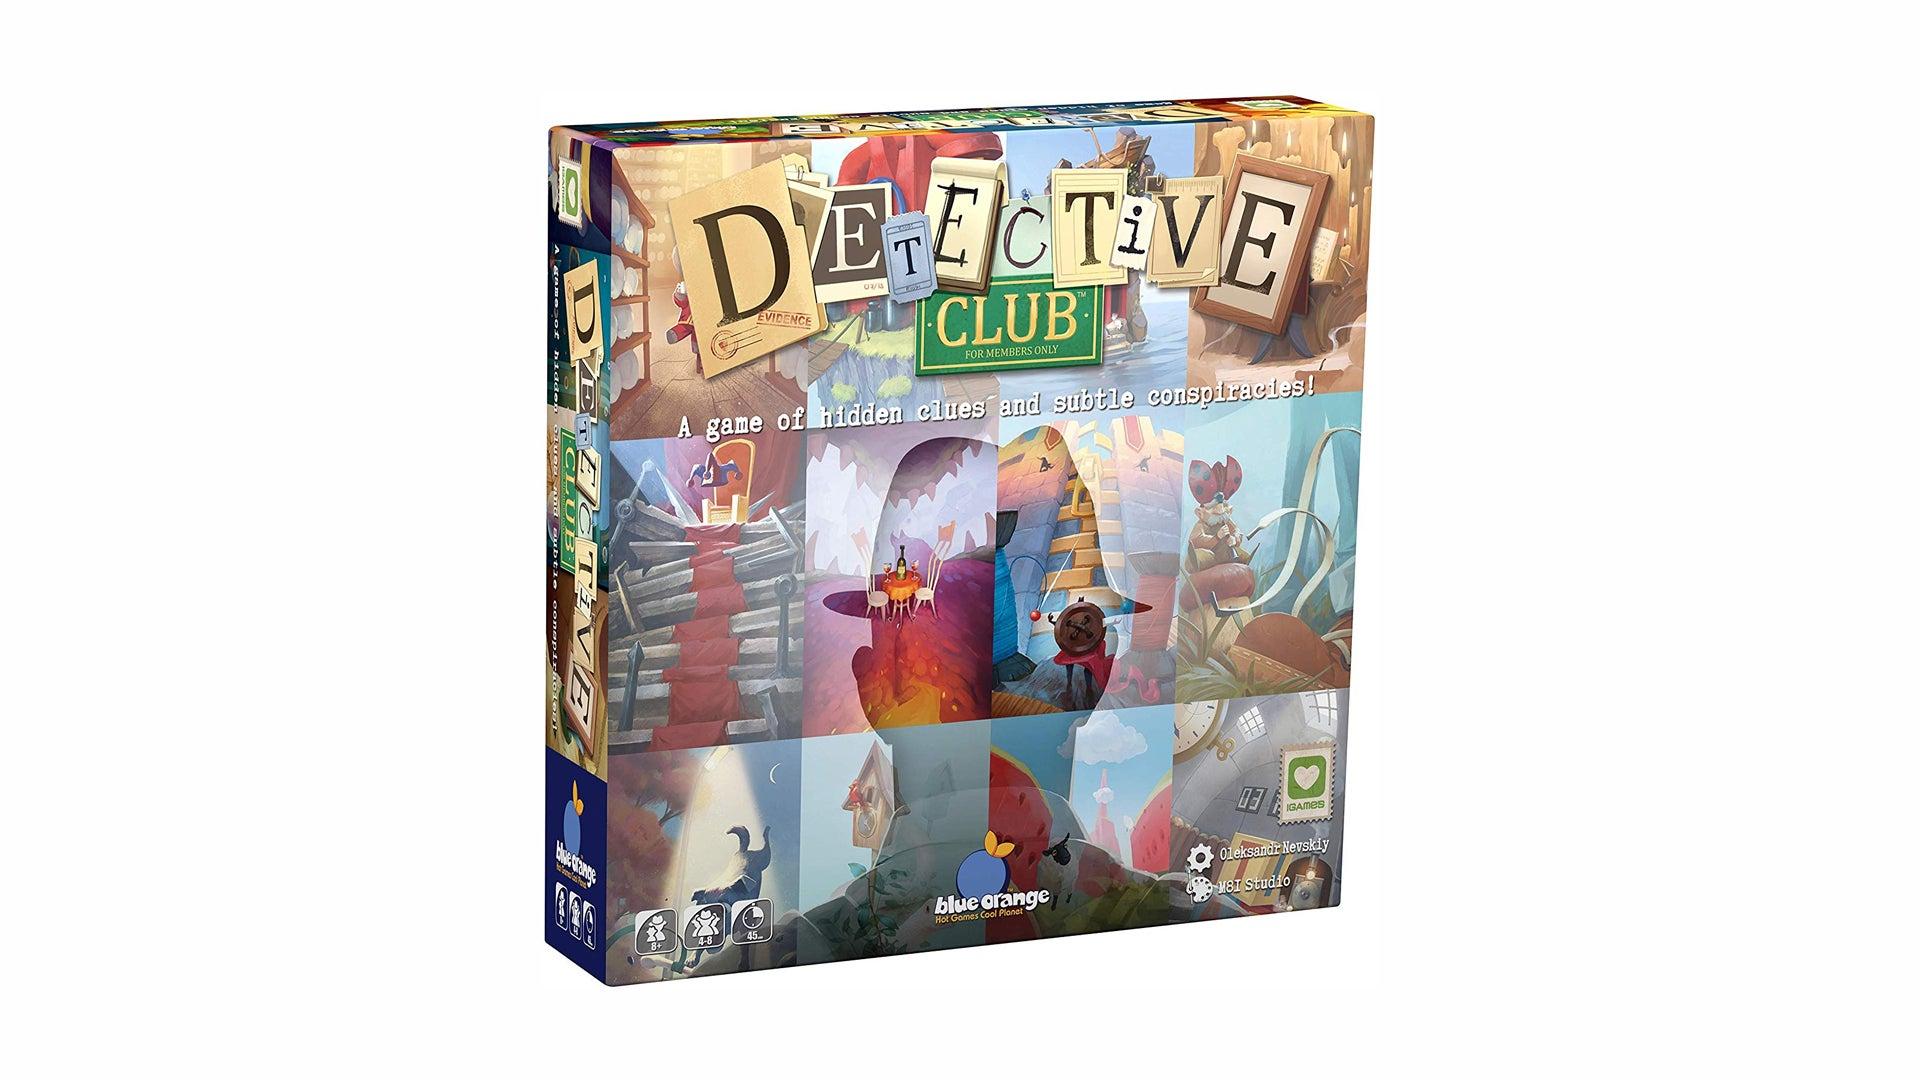 Detective Club board game box